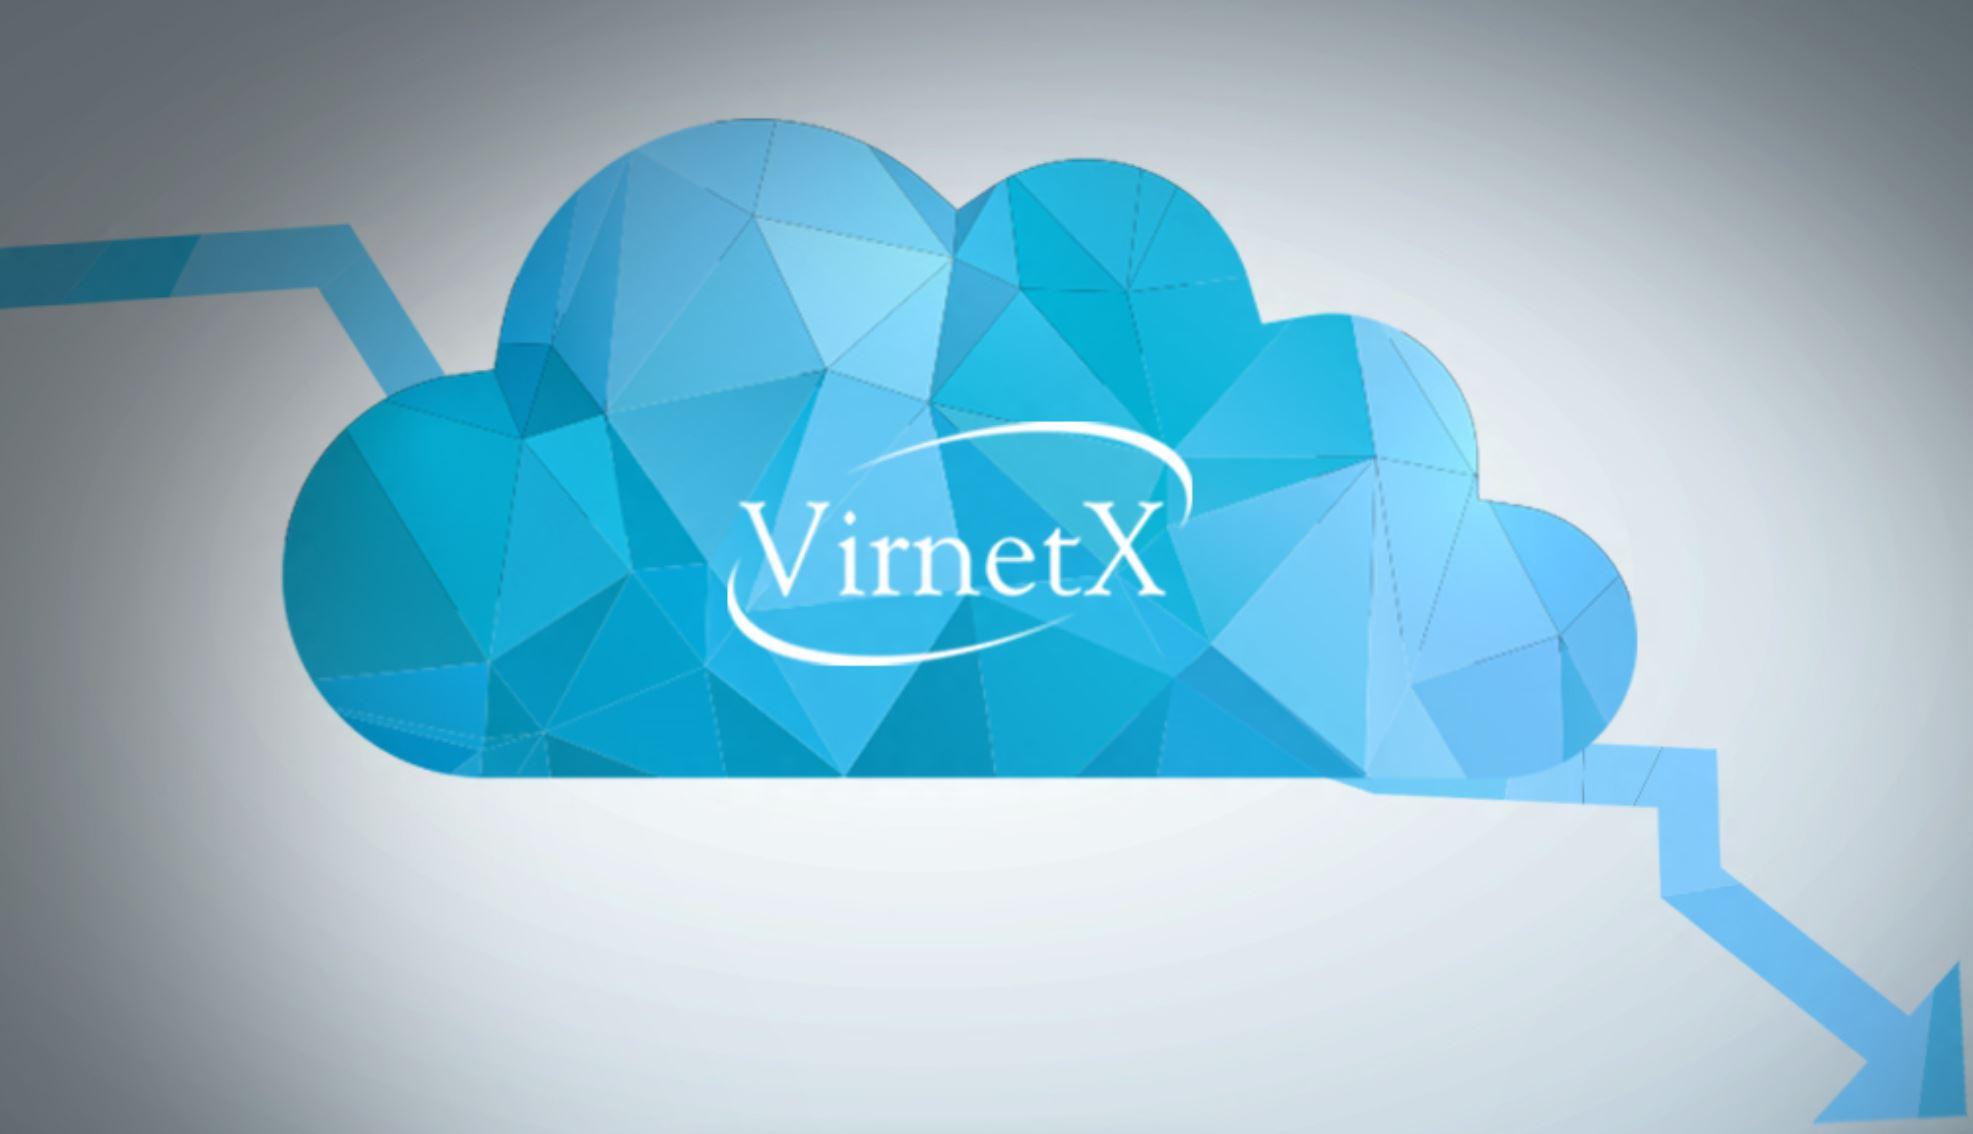 VirnetX Patent Microsoft